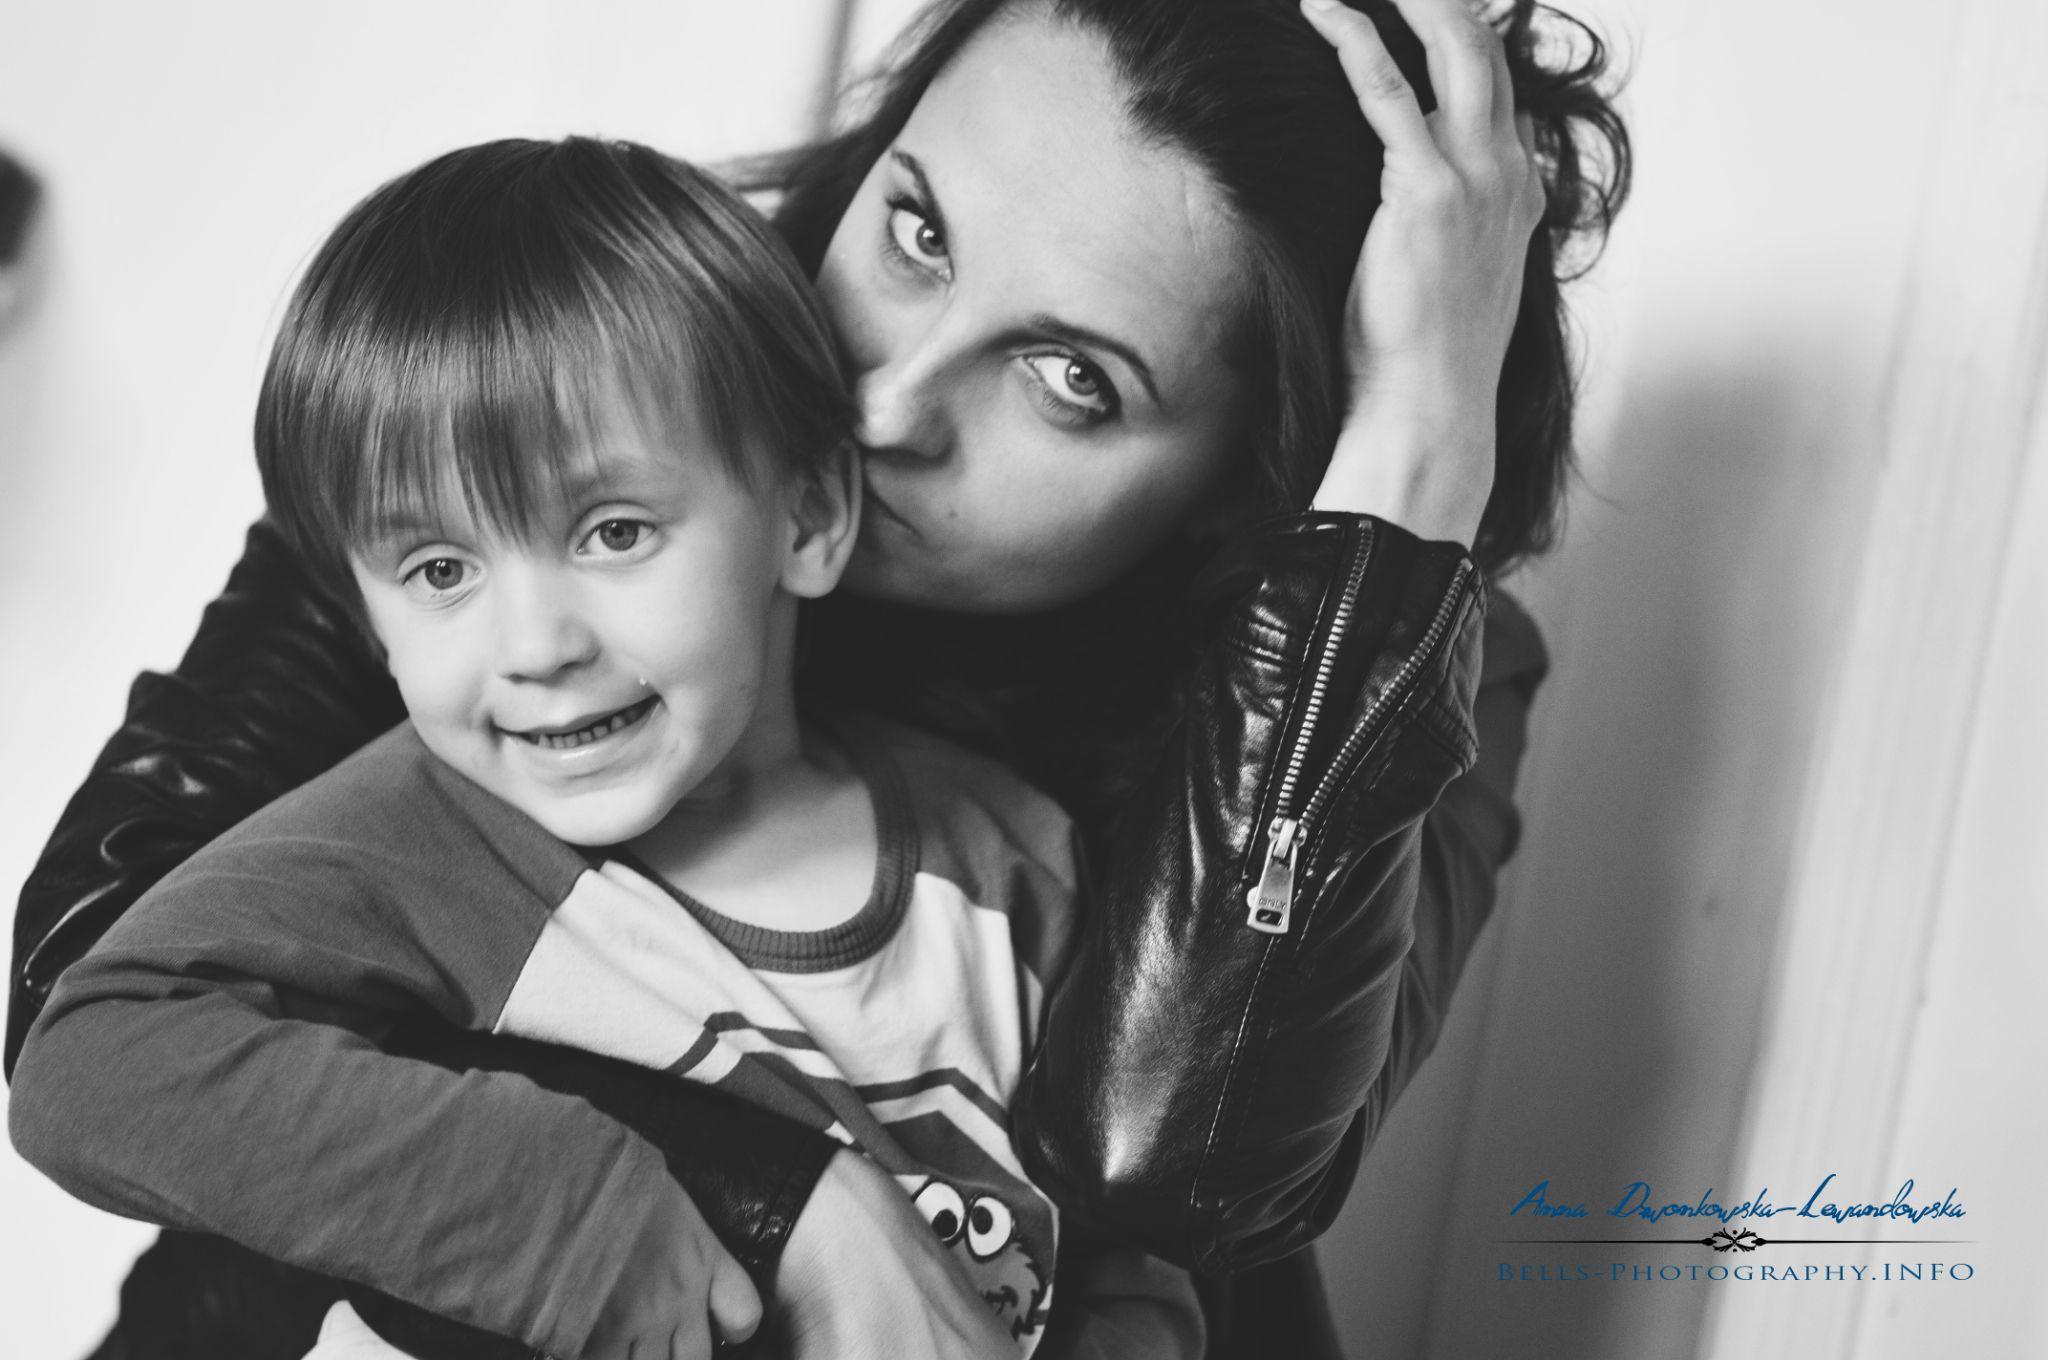 me and Wojtek - photo by my 6 years son:) by Anna Dzwonkowska-Lewandowska